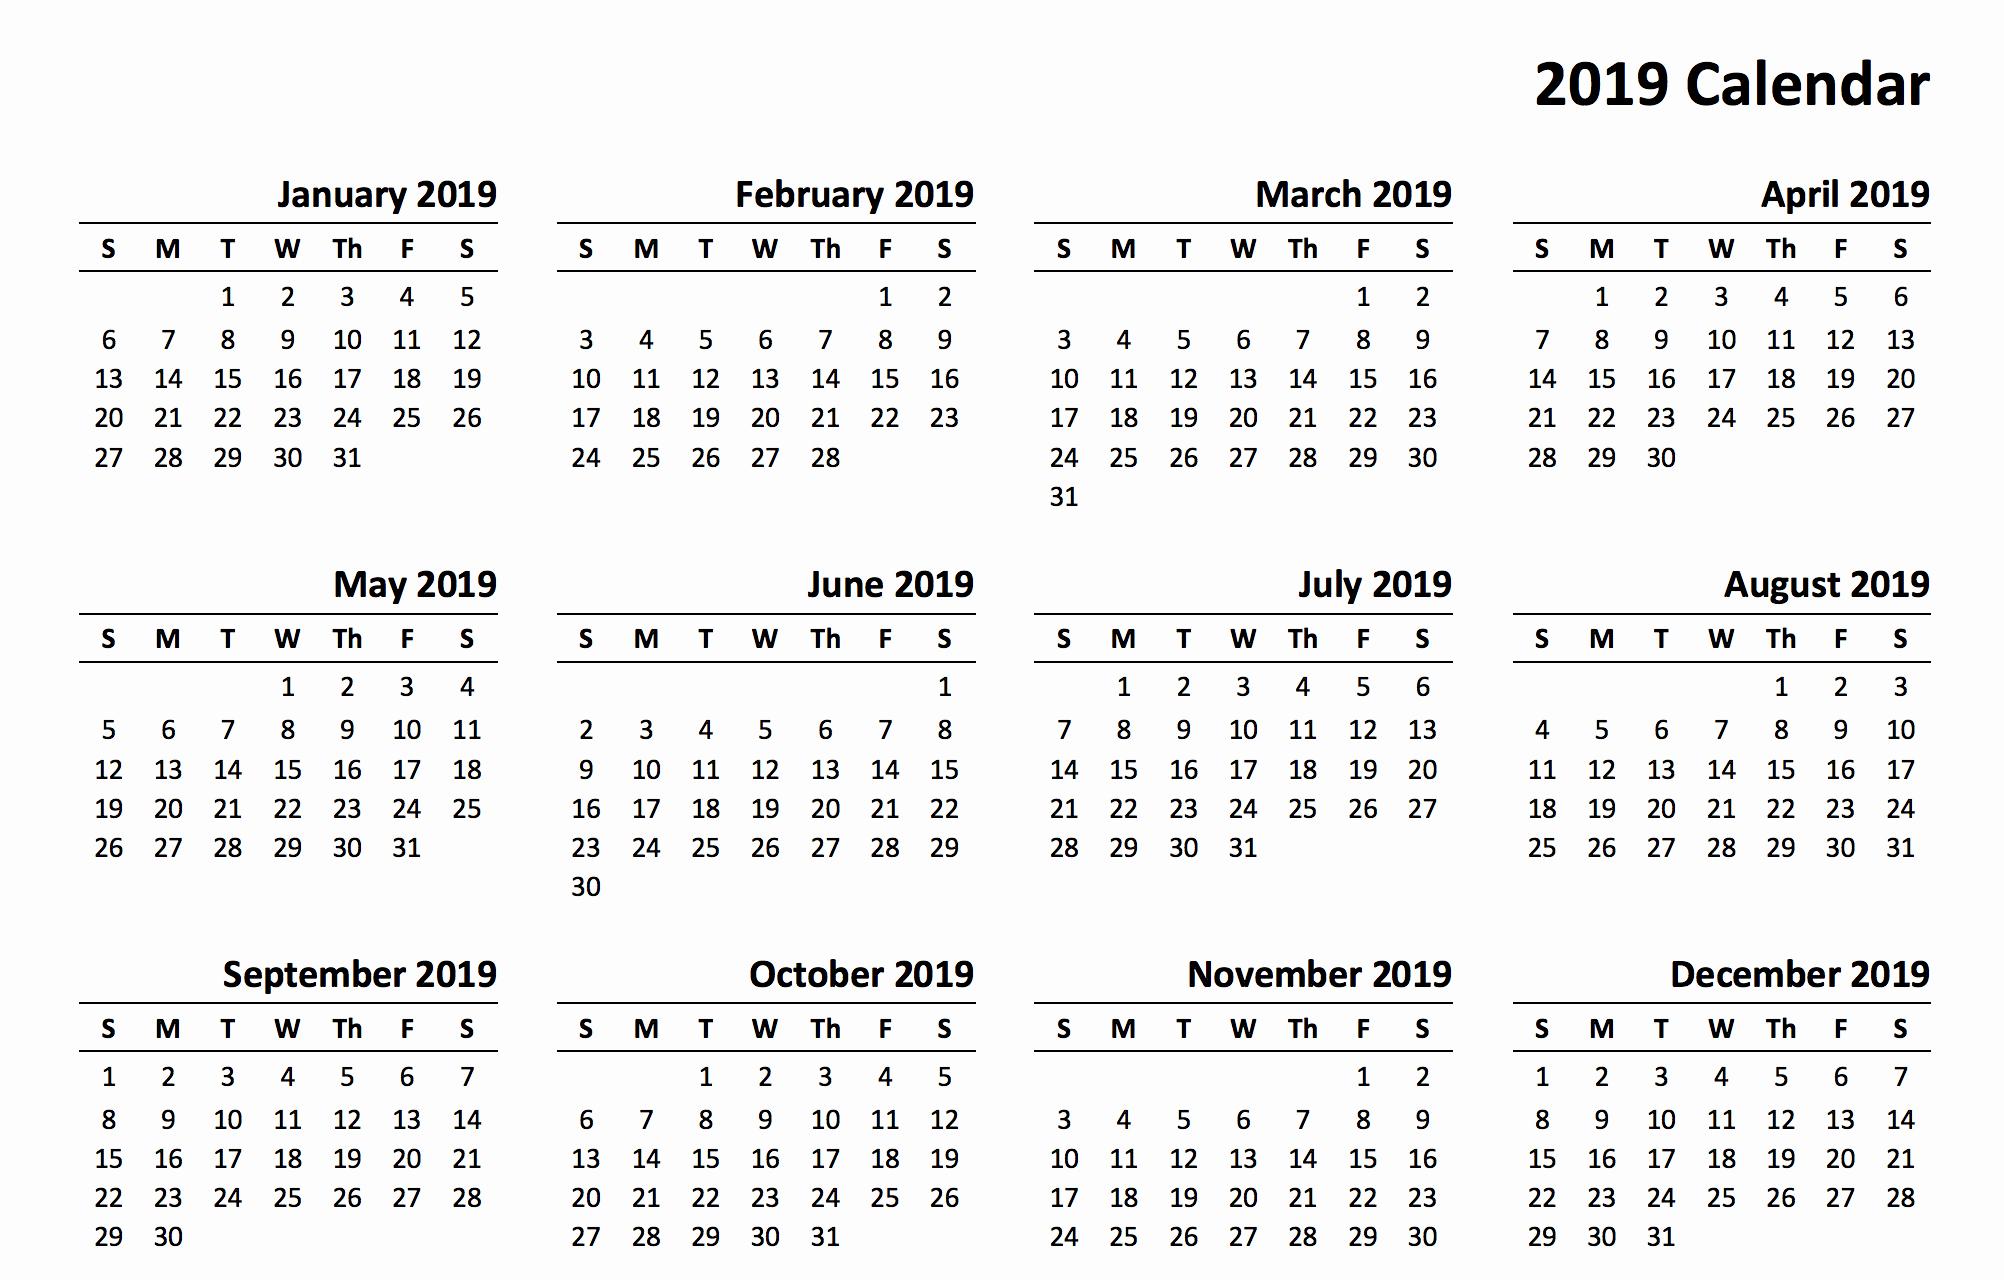 Free Printable Calendar Templates 2019 Luxury 2019 Calendar Amazonaws